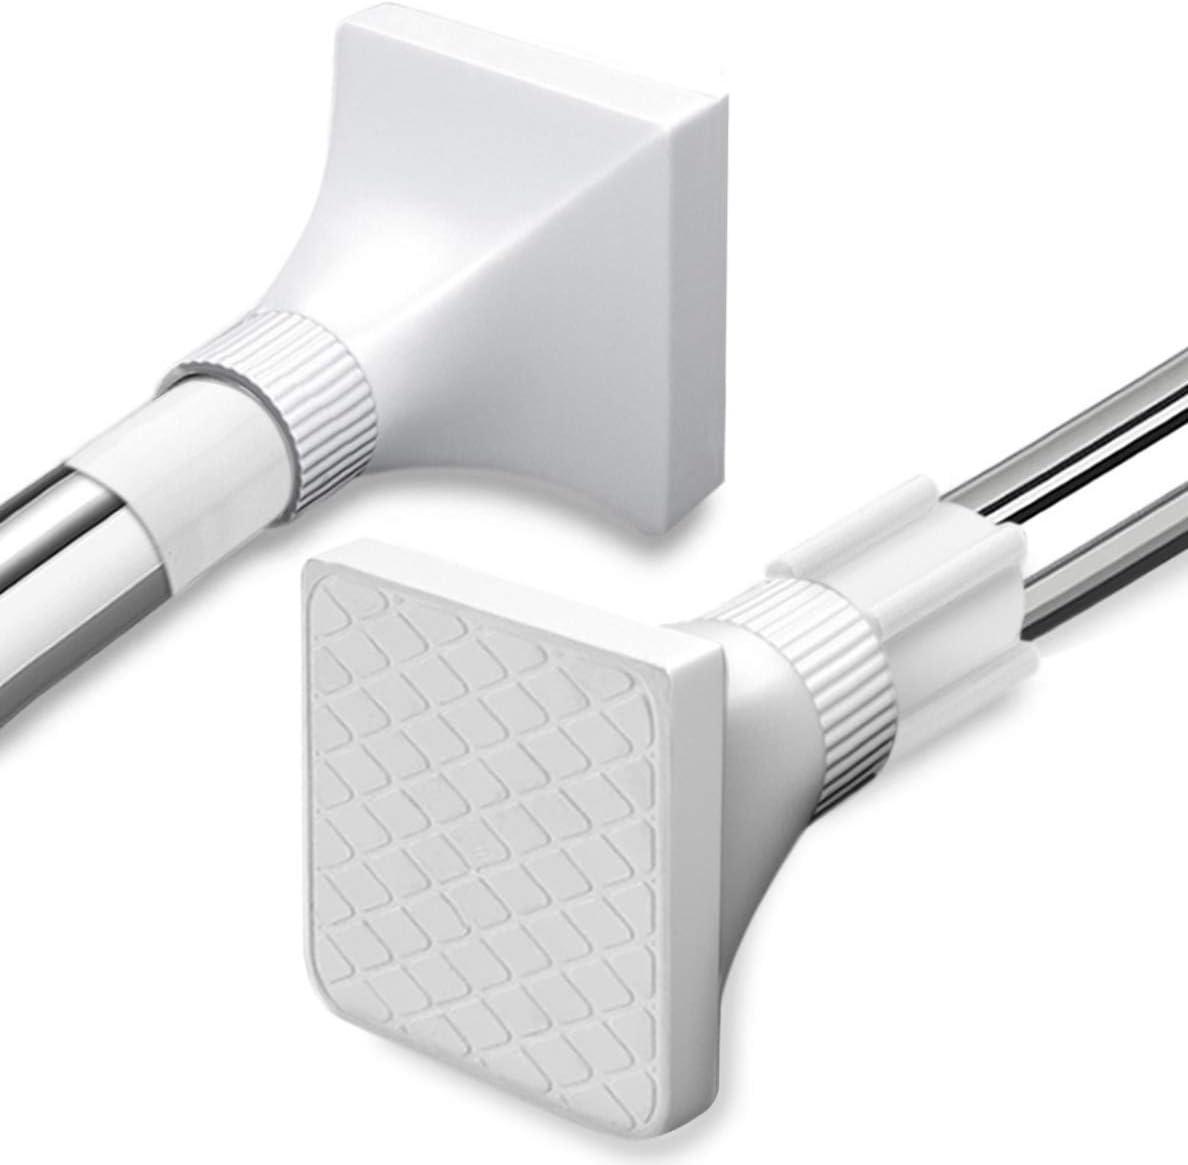 No Dril Extendable Telescopic Shower Curtain Tension Rod Stainless Steel Aluminium Telescopic Pole Rail Bath Closet Hanging Pole (68-120cm)